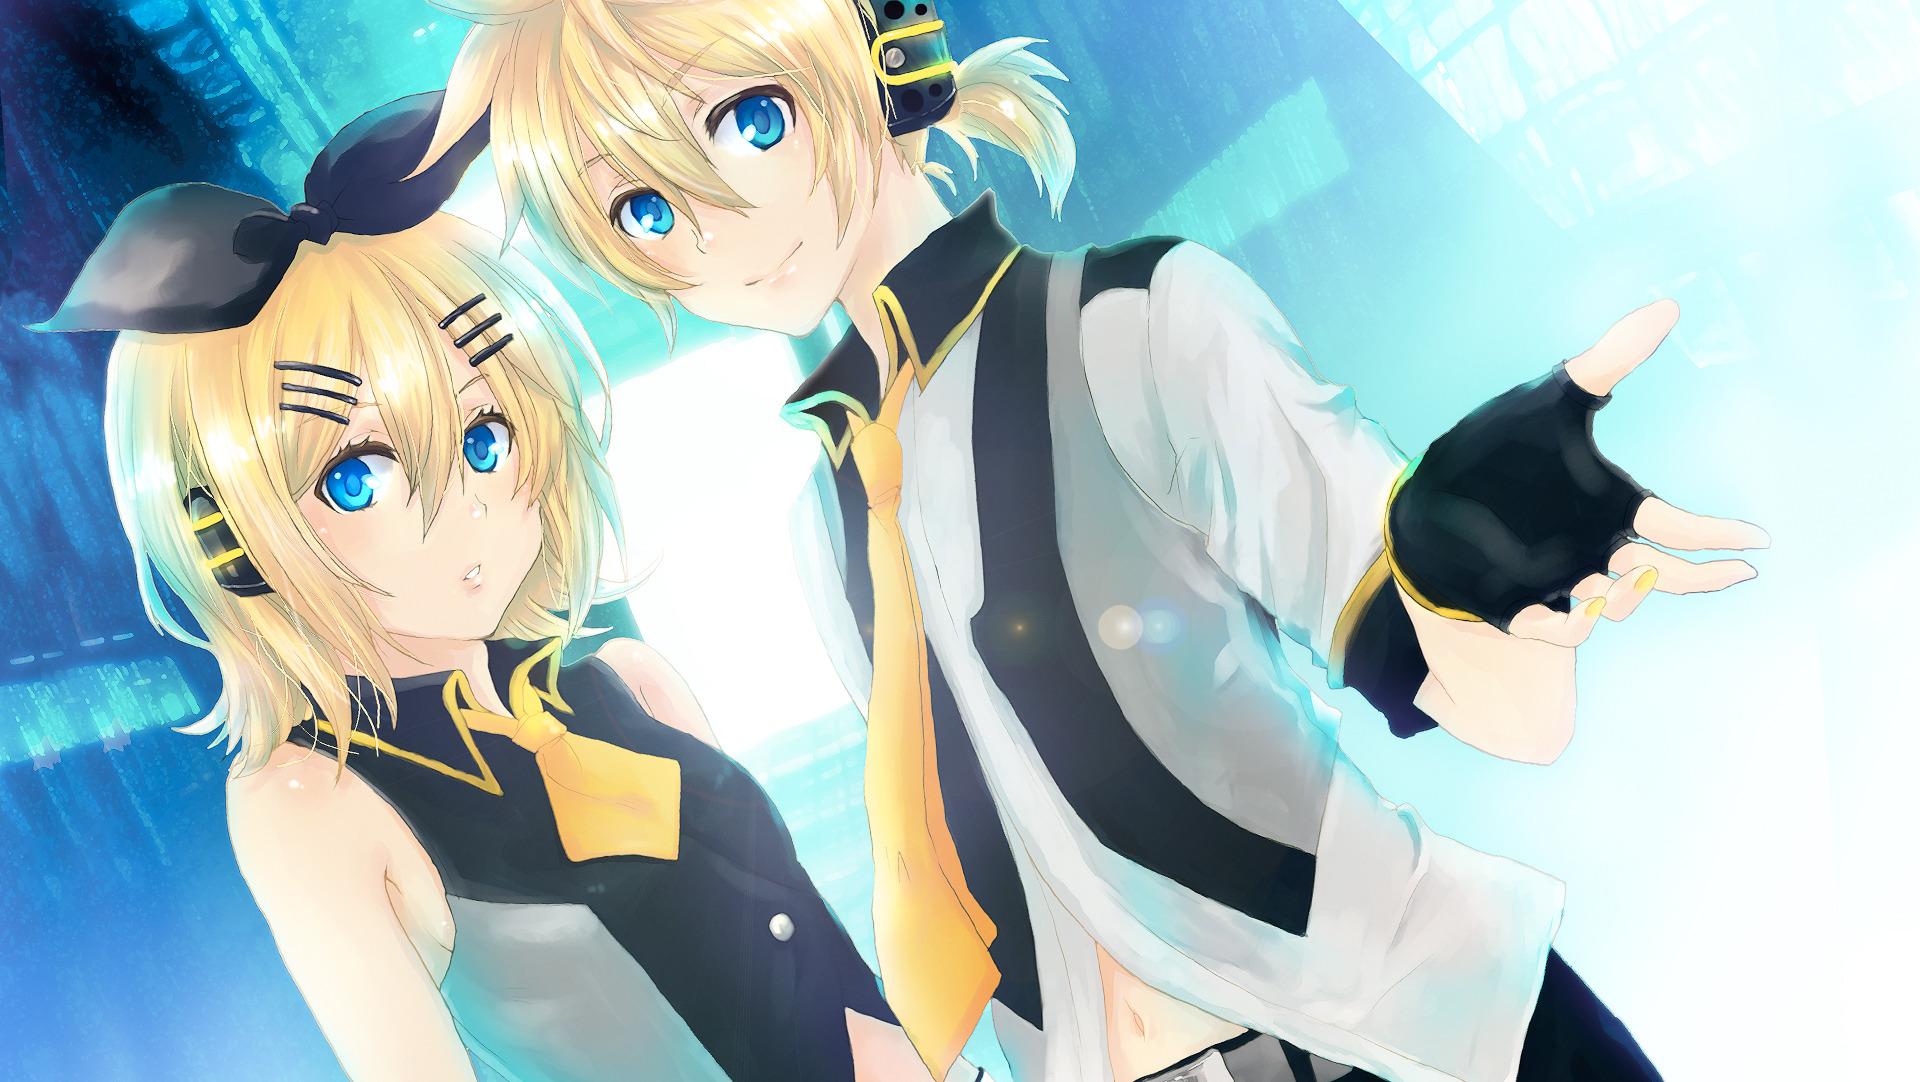 Kagamine mirrors vocaloid wallpaper 1574394 zerochan anime image board - Kagamine rin project diva ...